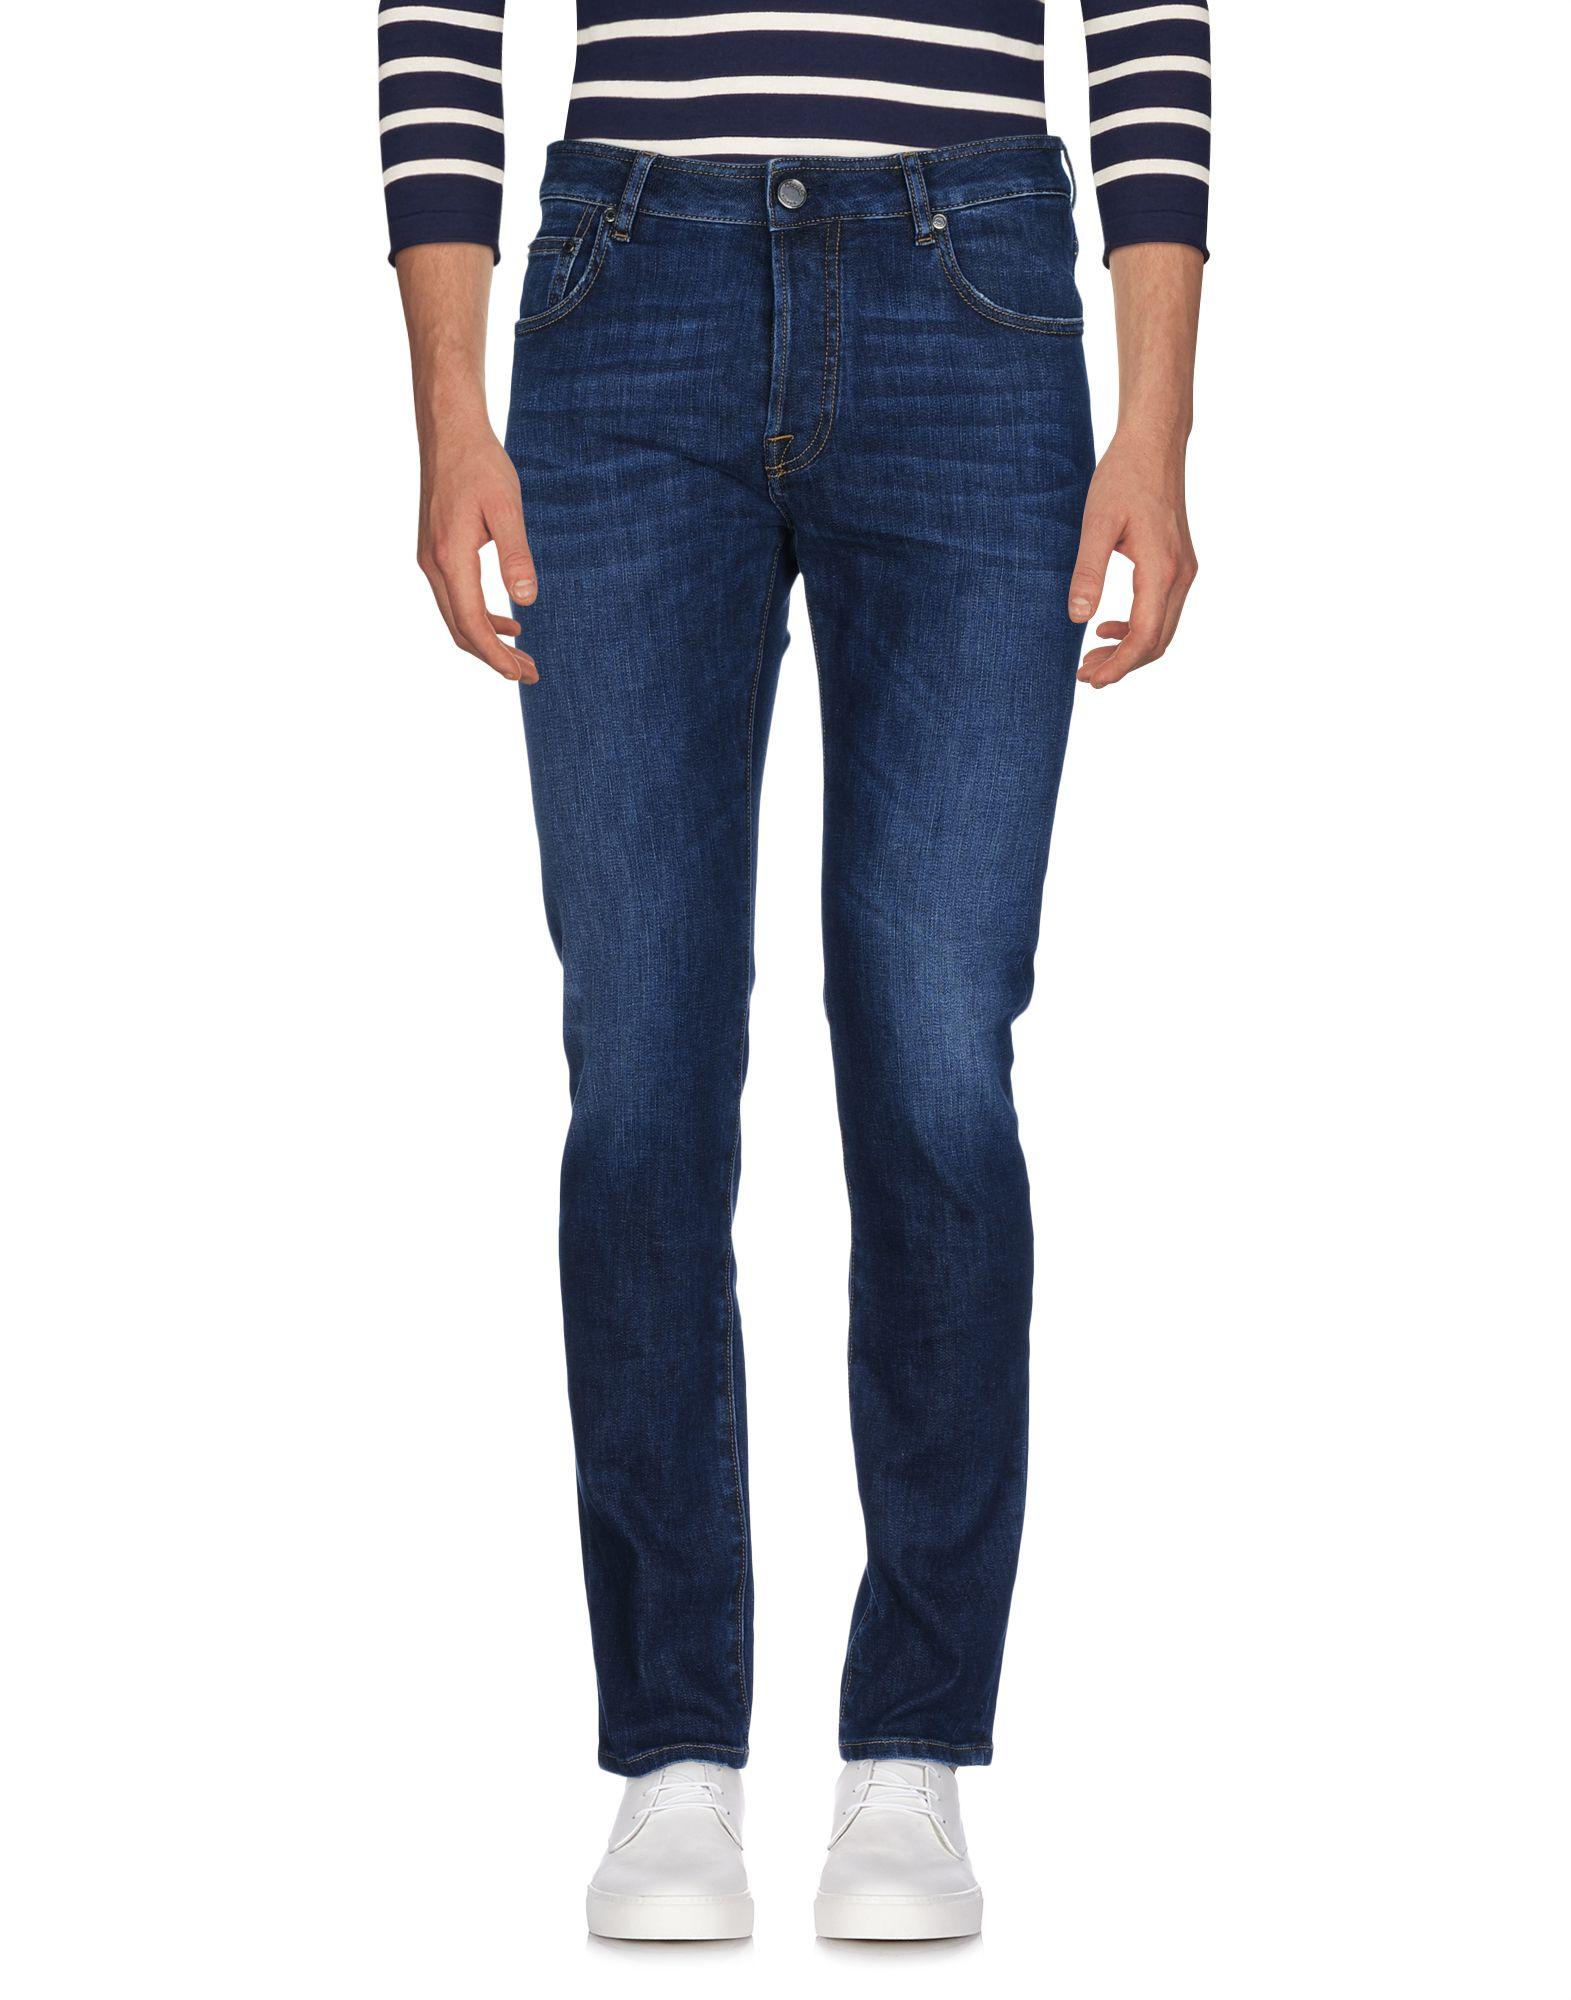 Pantaloni Jeans Moorer Uomo - 42626280XG 42626280XG - c26cdf